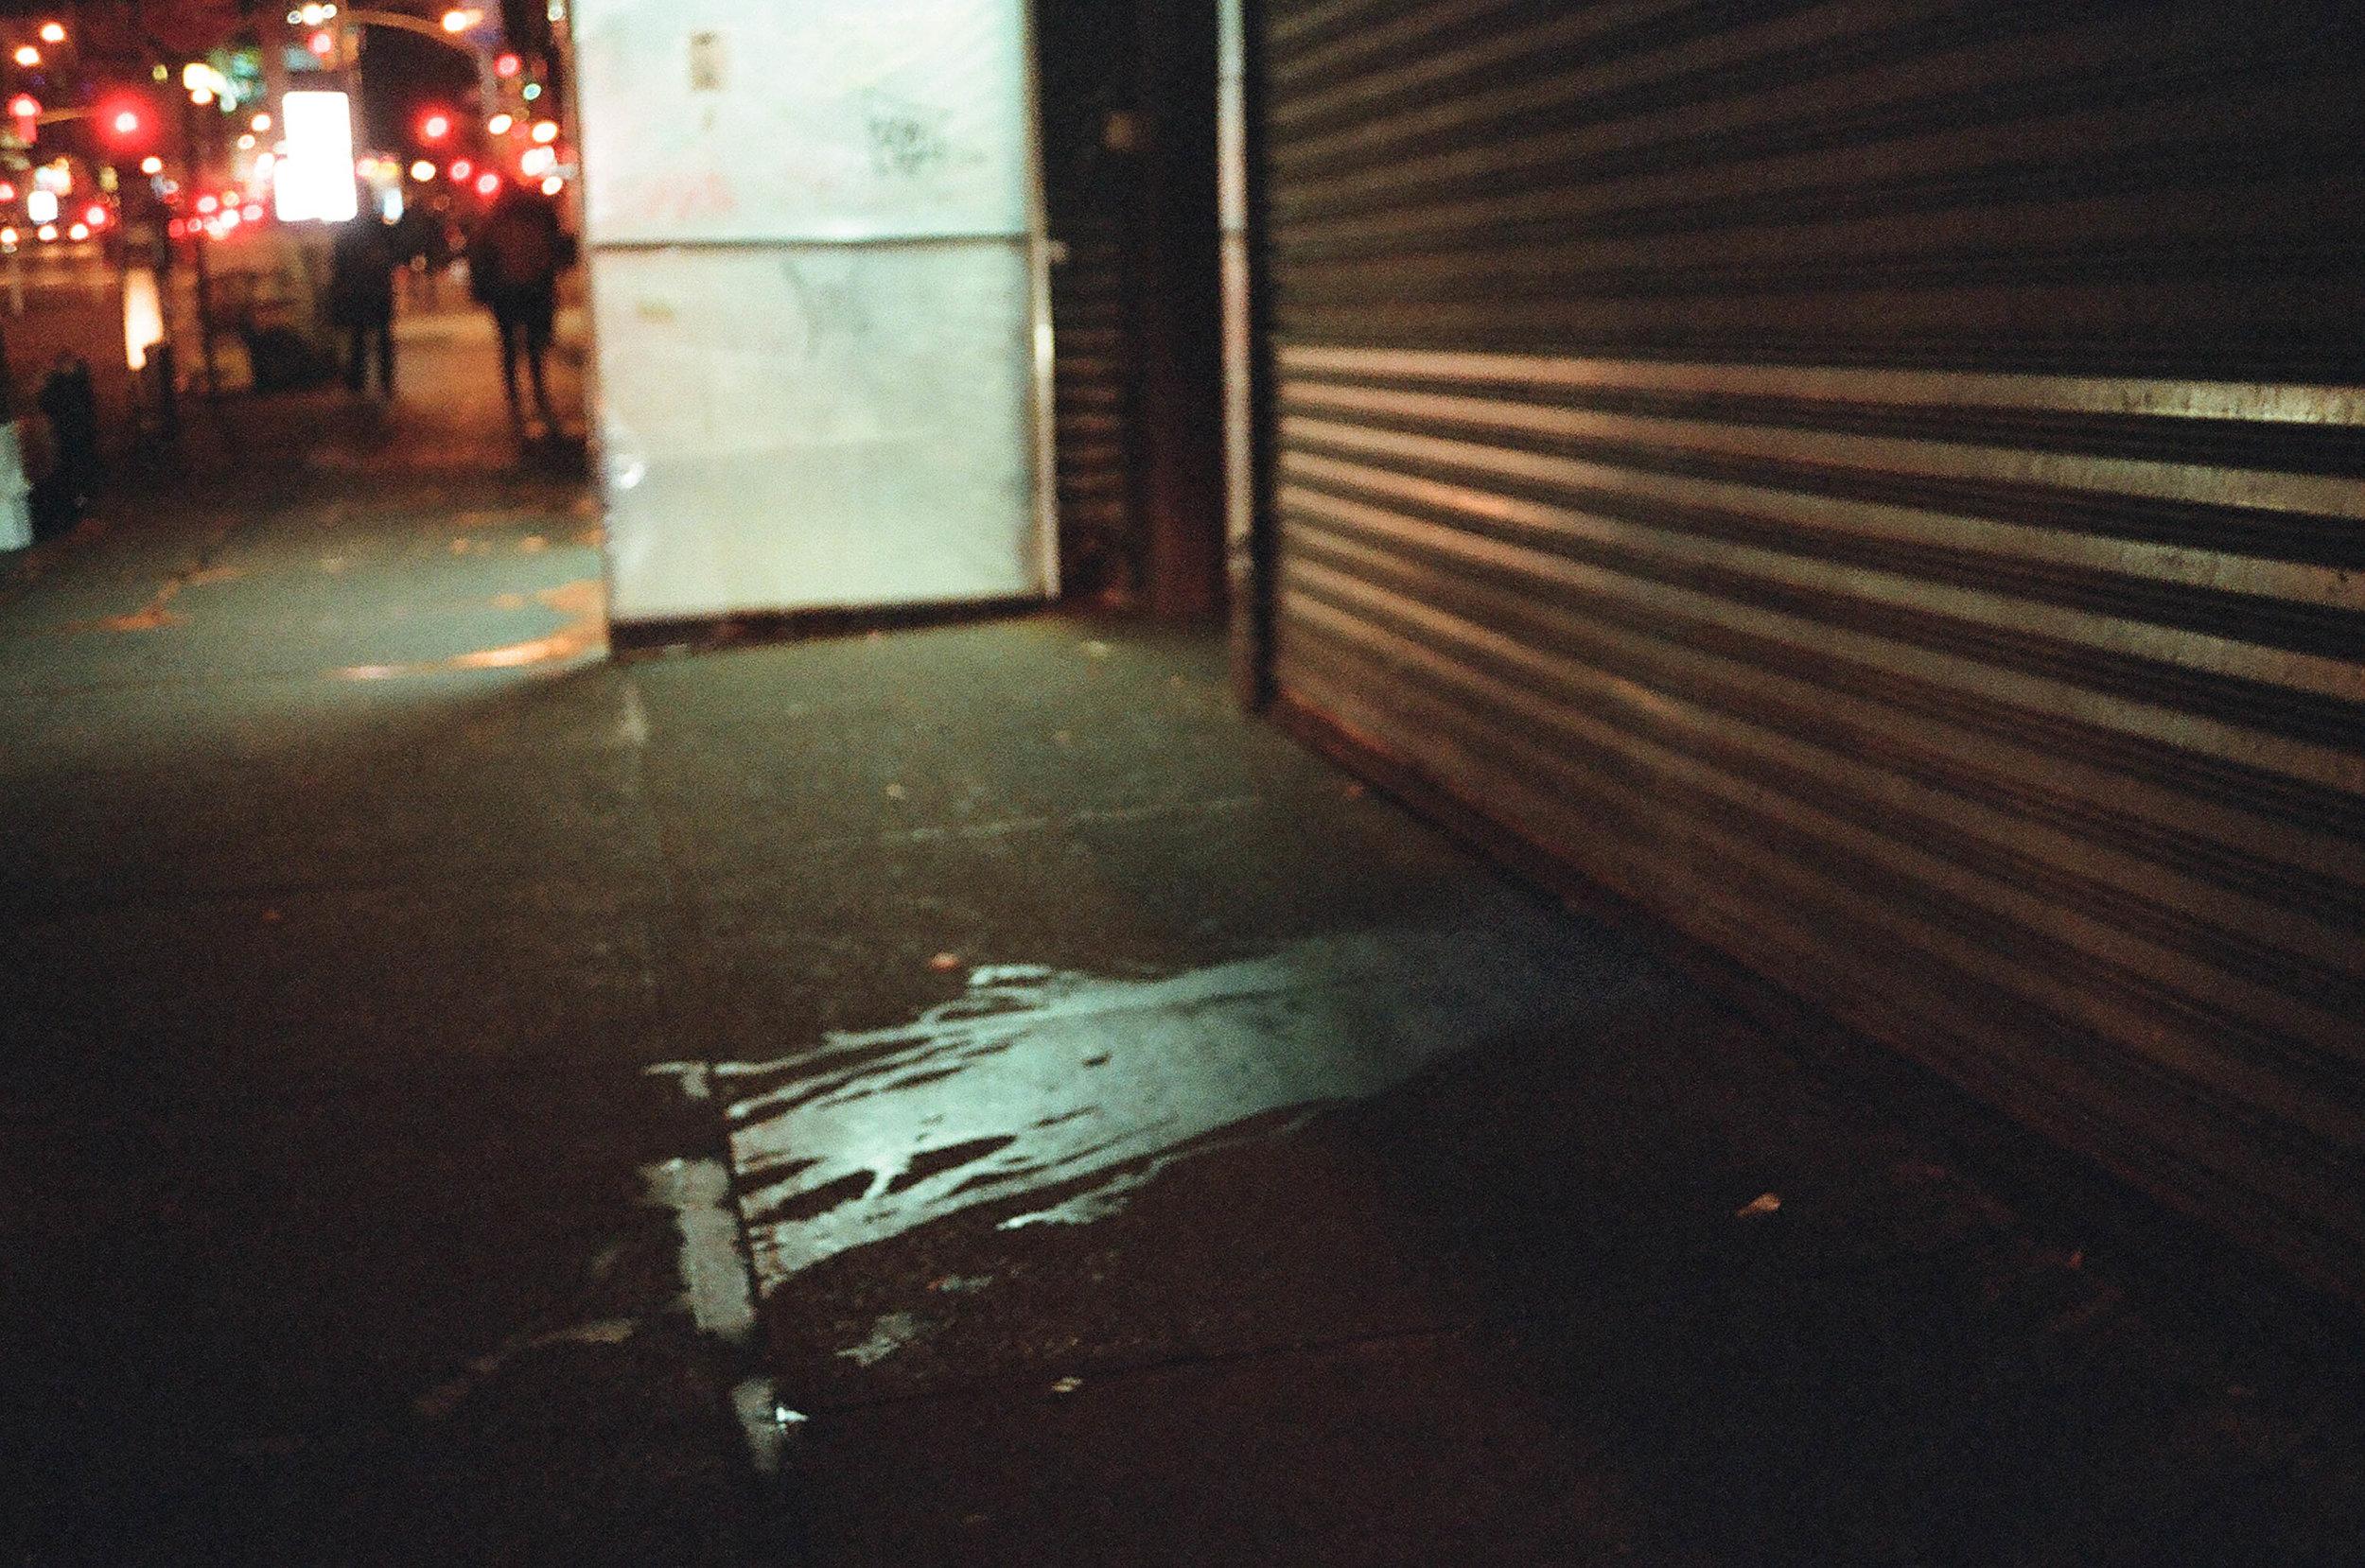 new-york-city-street-photographer-matt-anderson-9.jpg